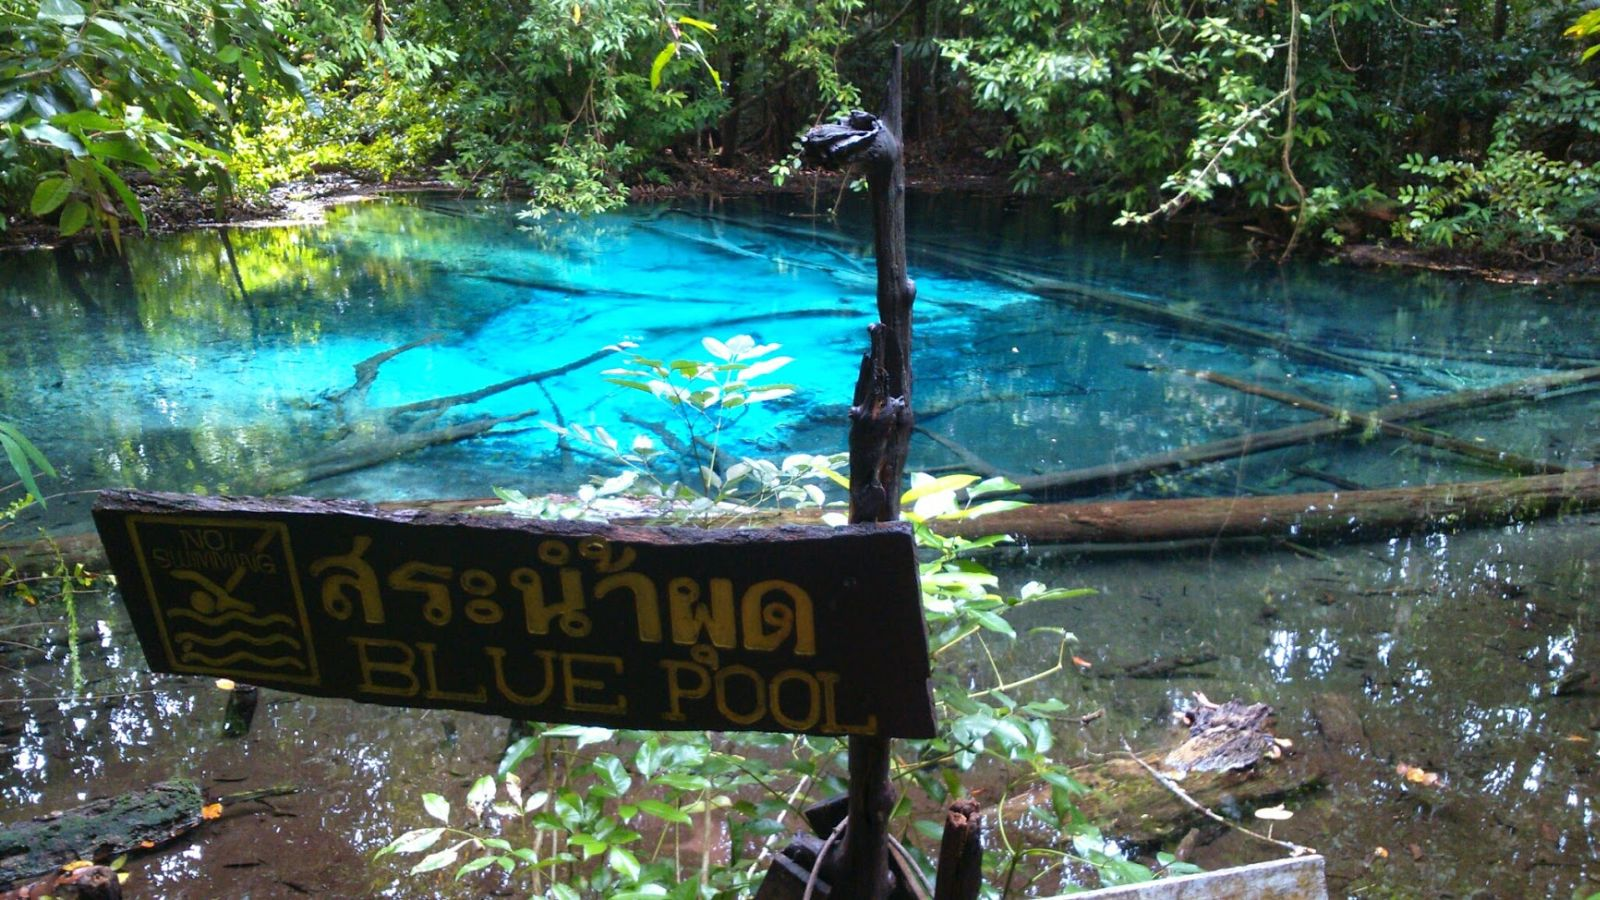 Blue Pool, niebieski basen, Krabi.